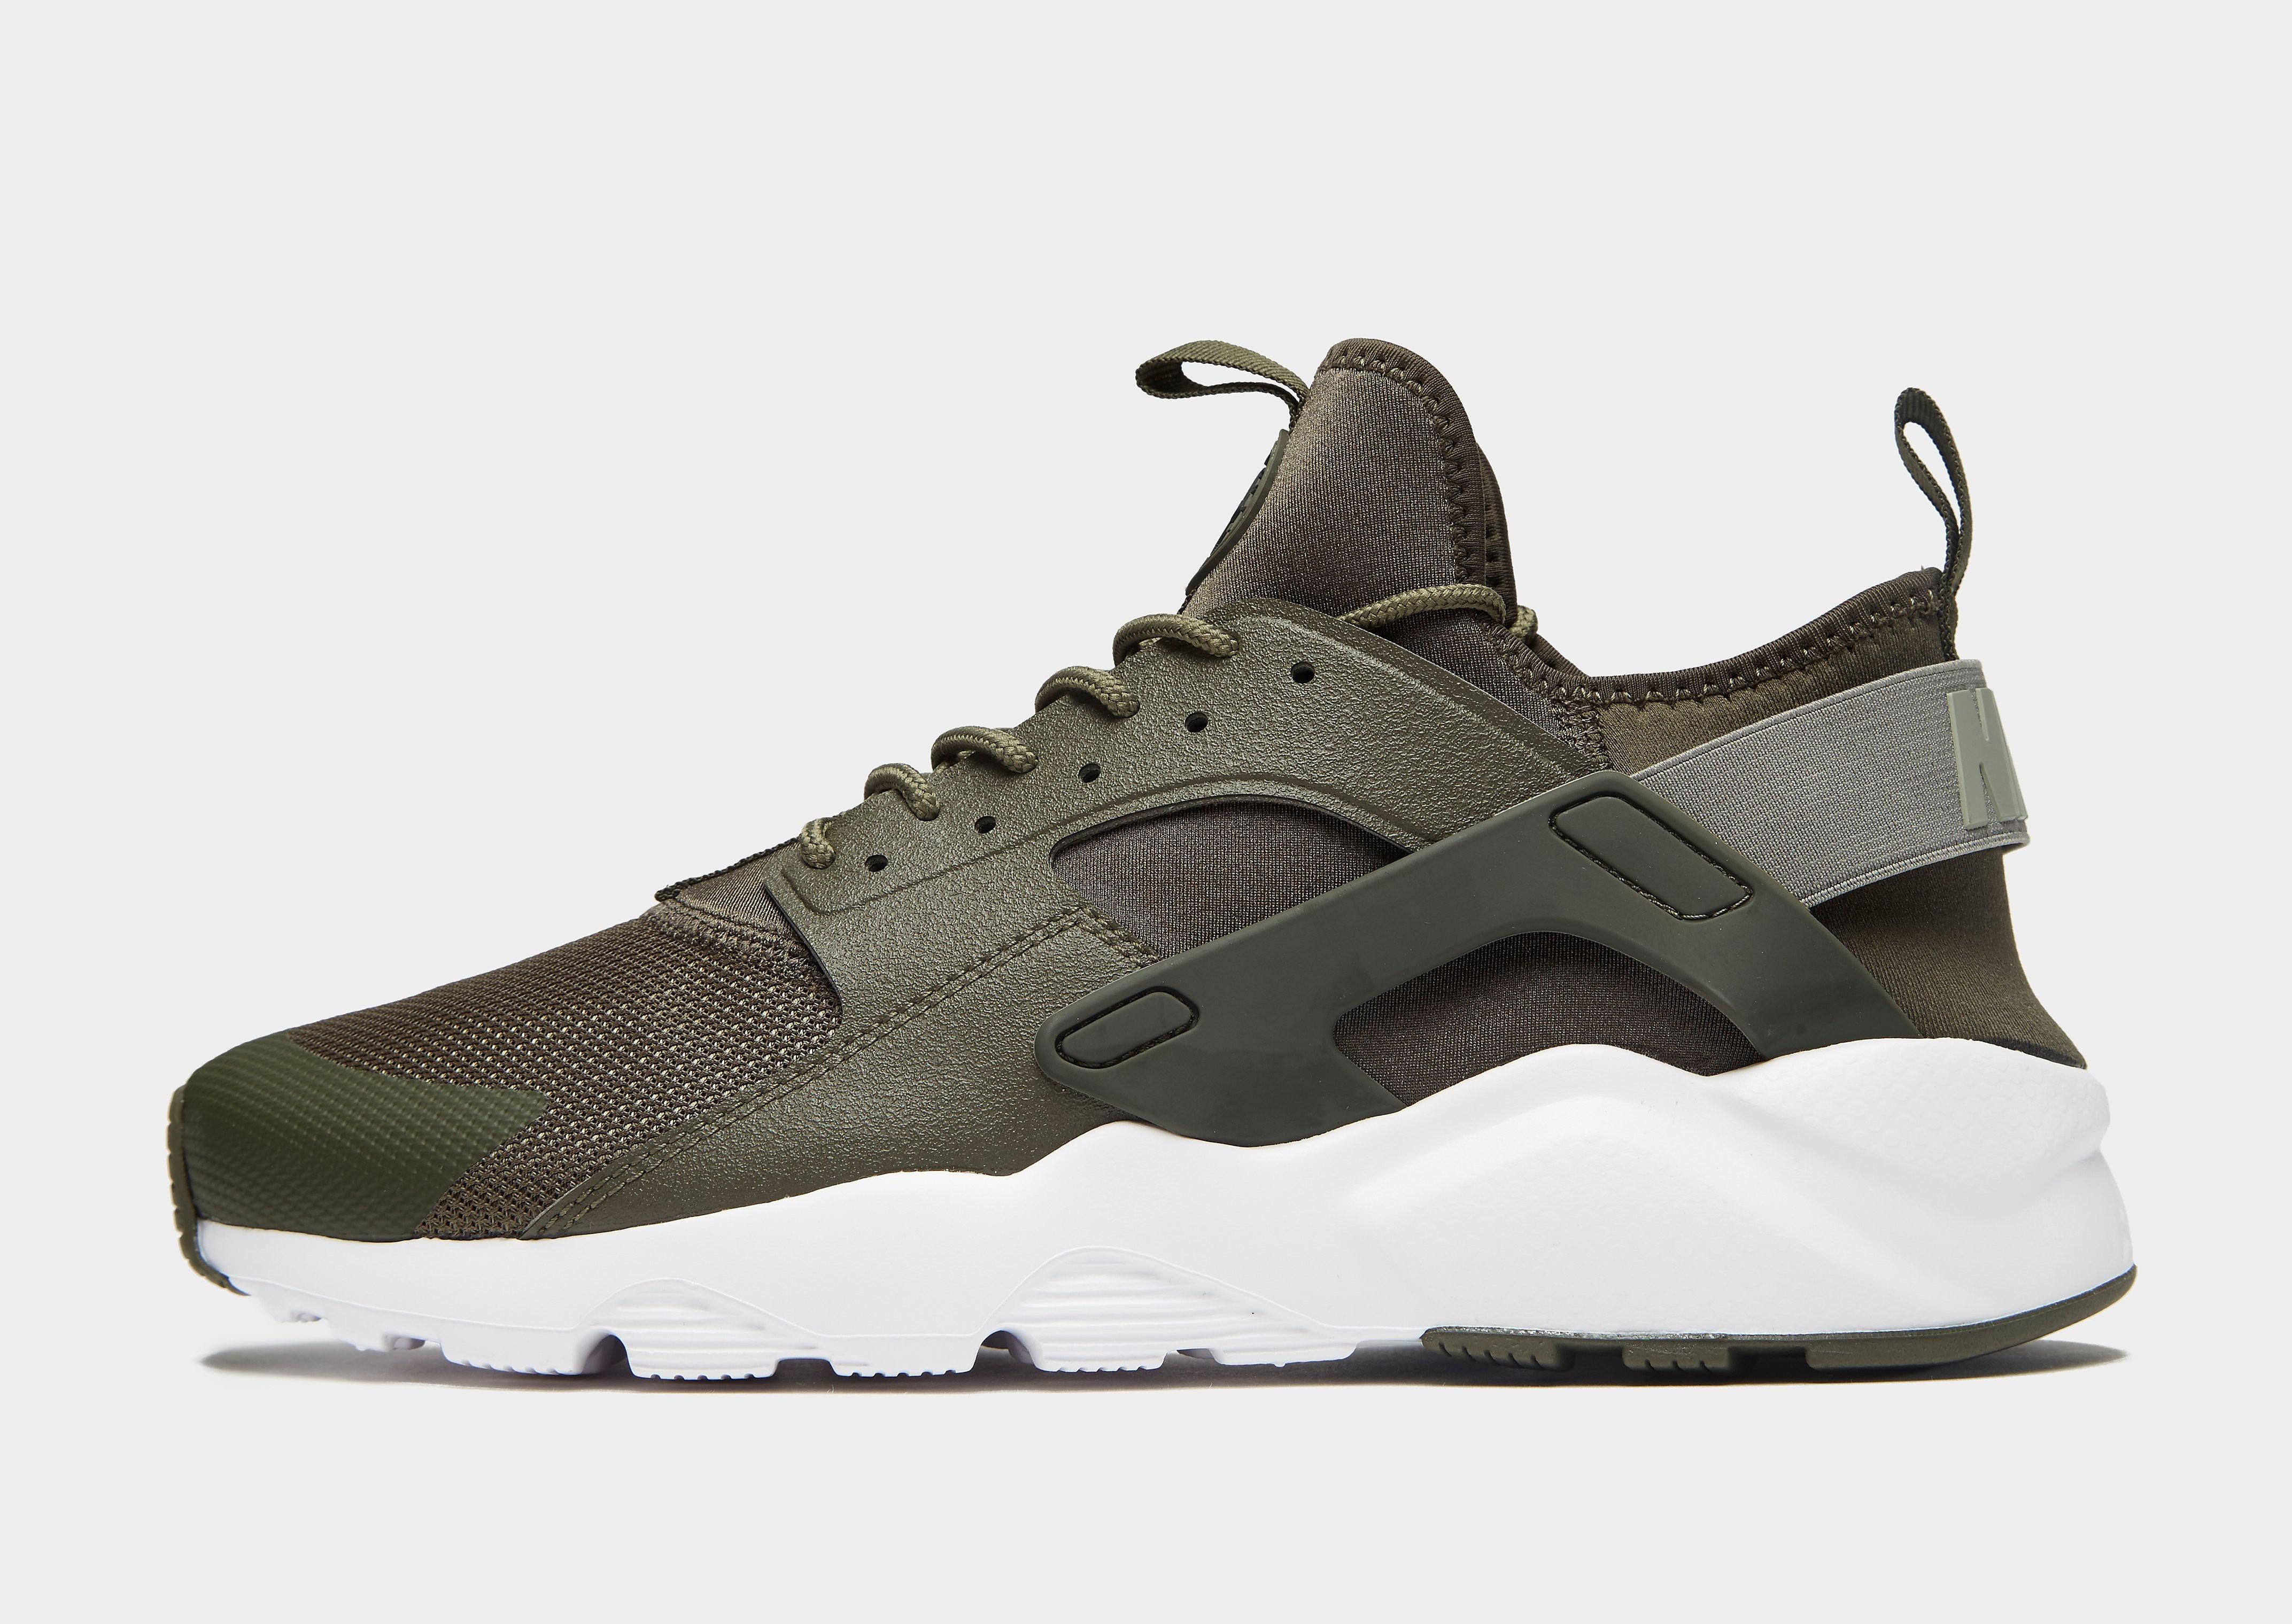 4053d4f78b0 Nike Air Huarache sneakers kopen | +500 modellen - theSneaker.nl